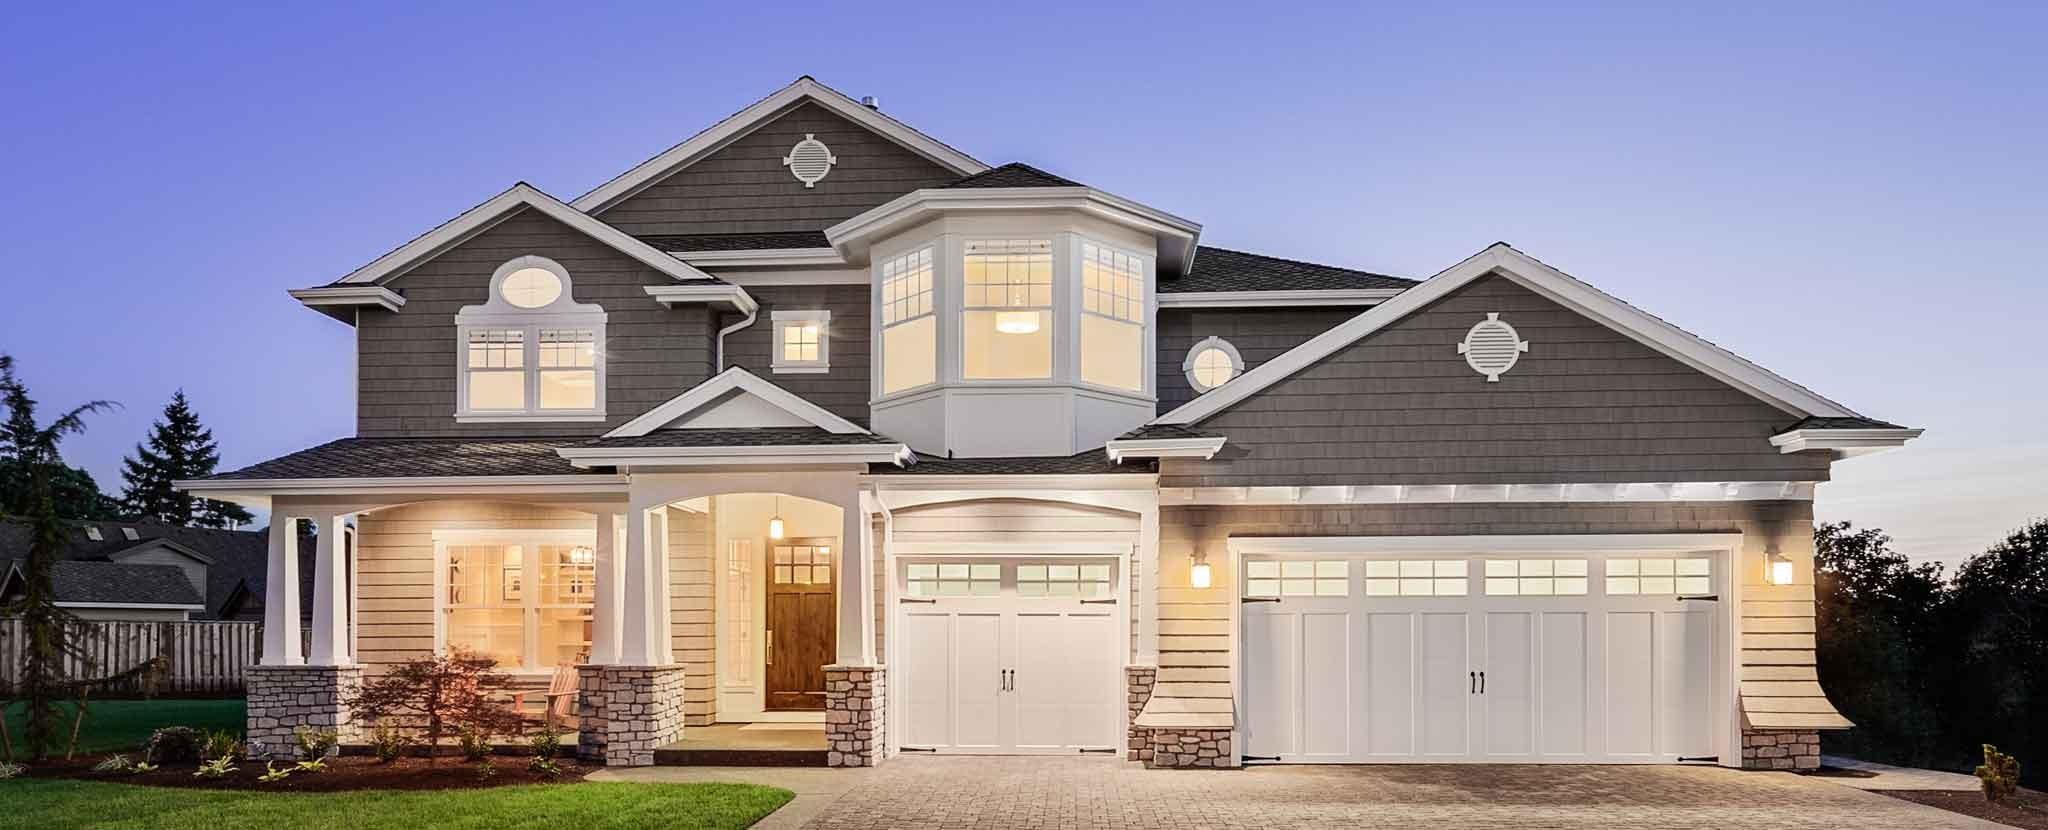 Realtors Share Their Tips To Find Best Mortgage Lenders In Utah